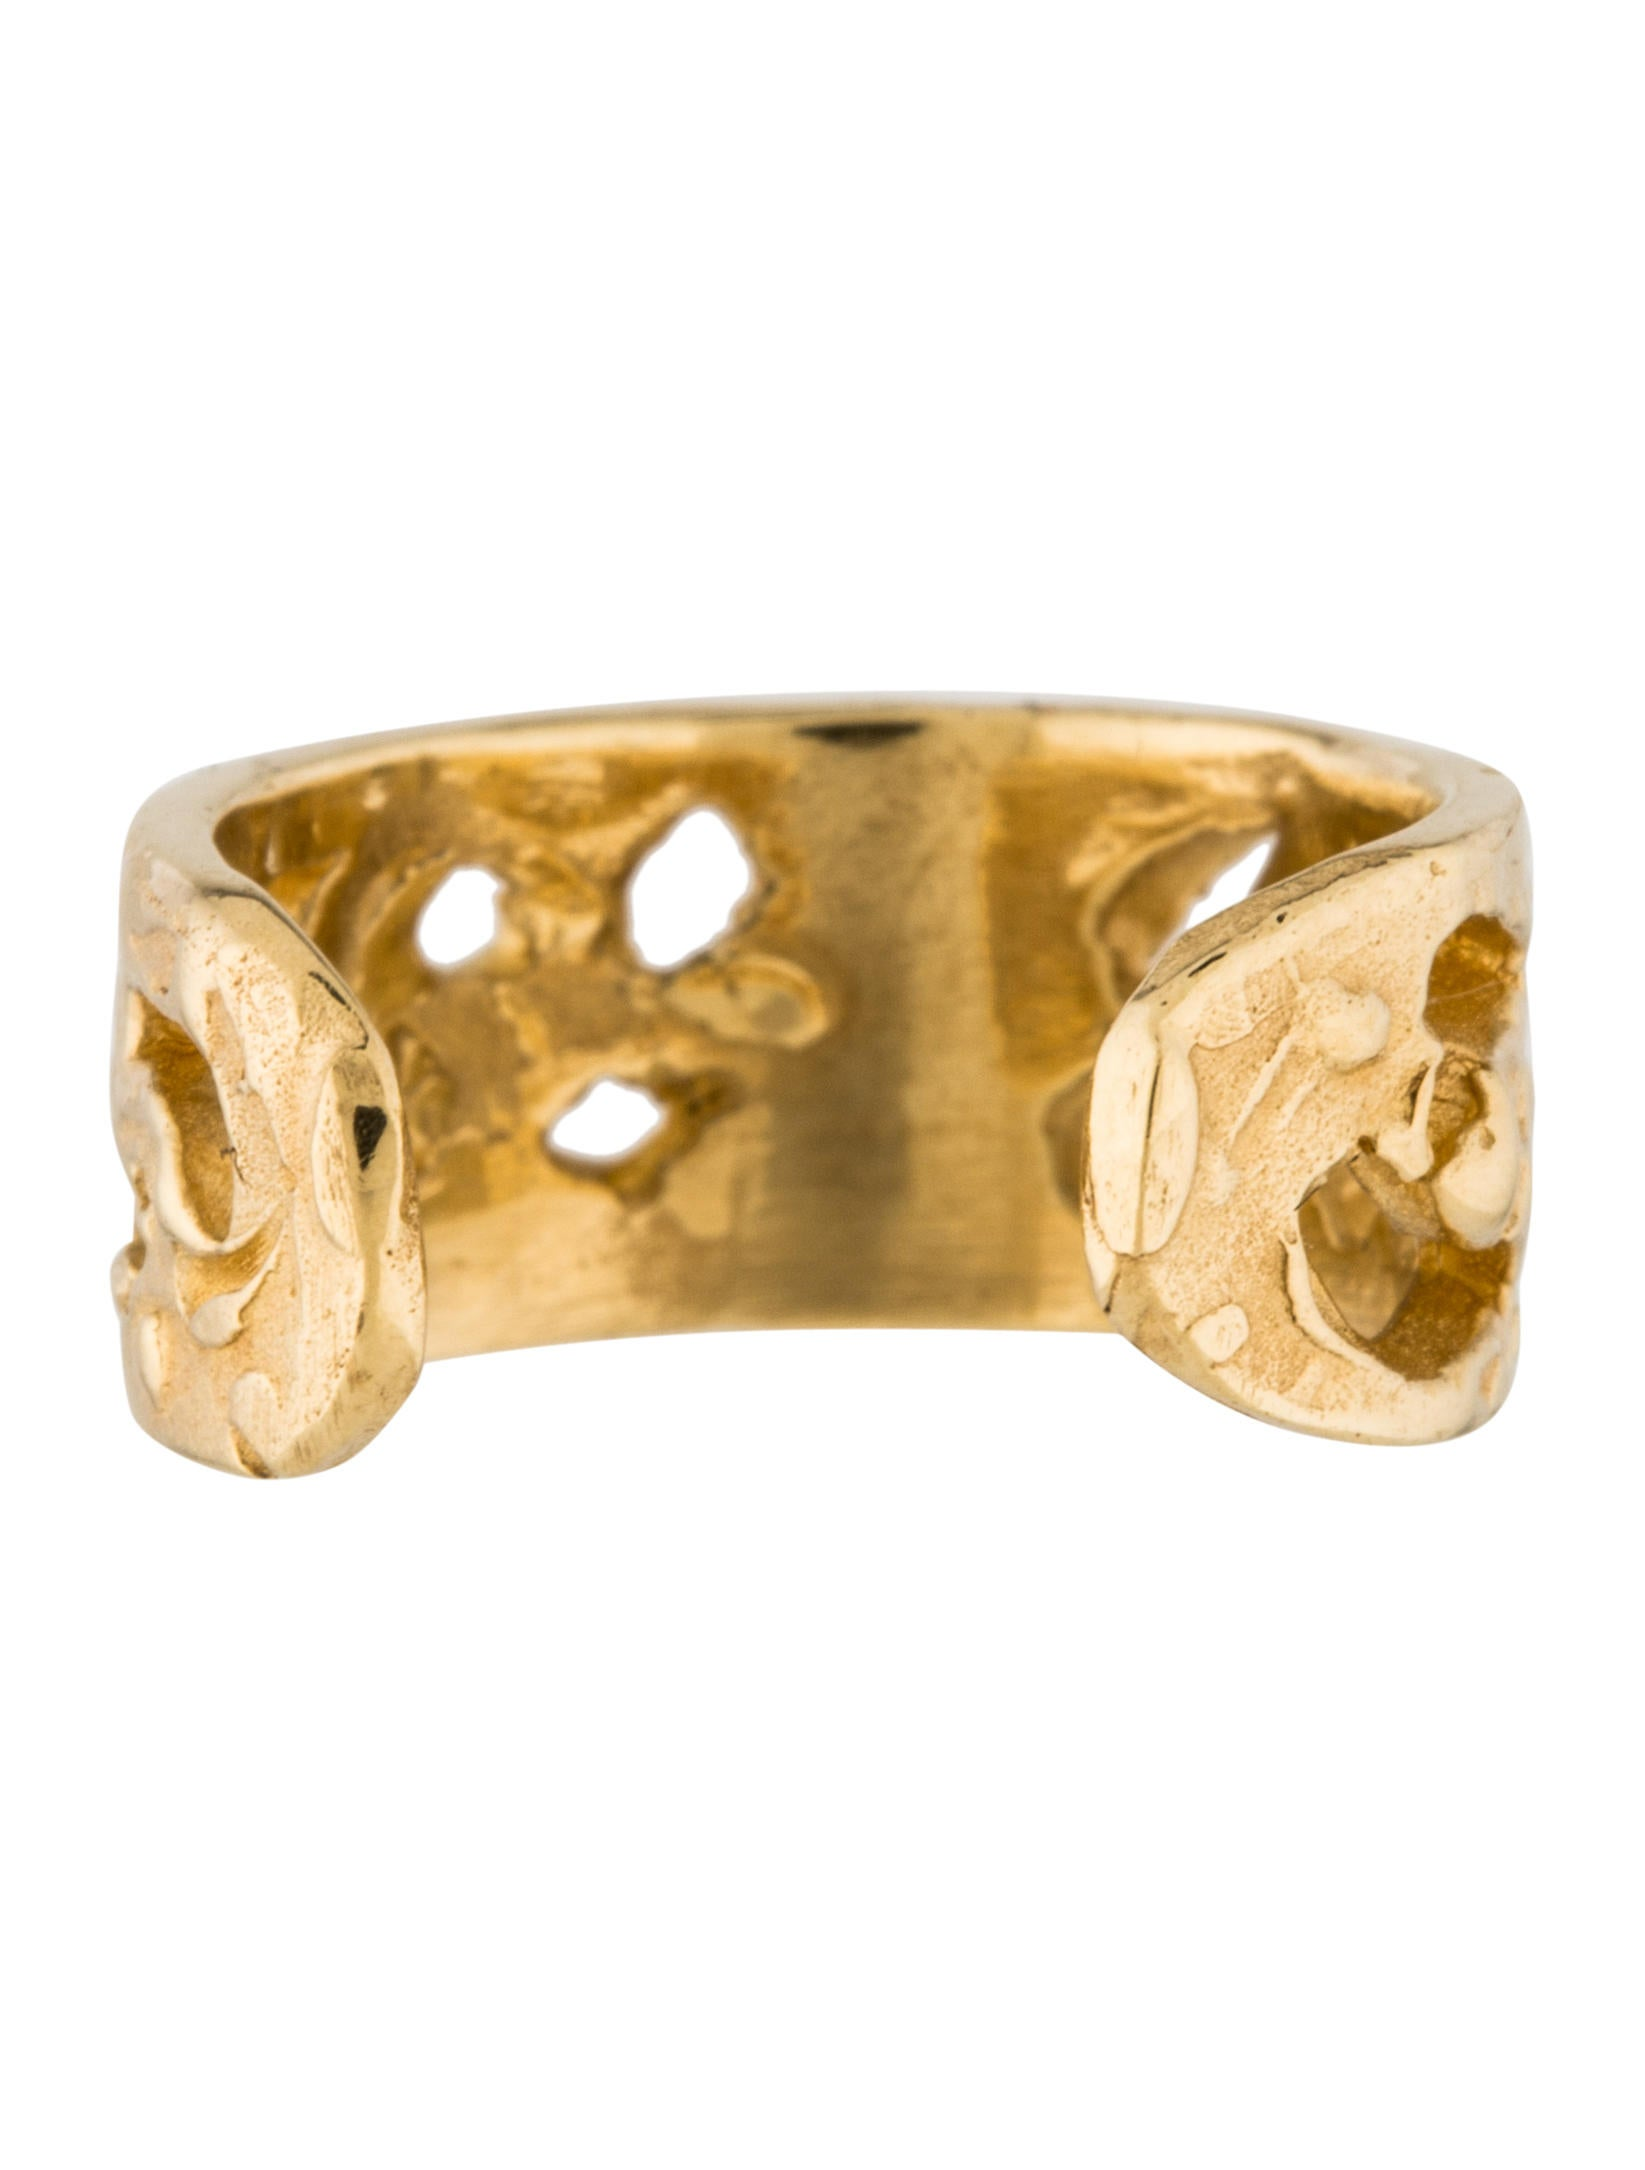 Real Diamond Midi Rings